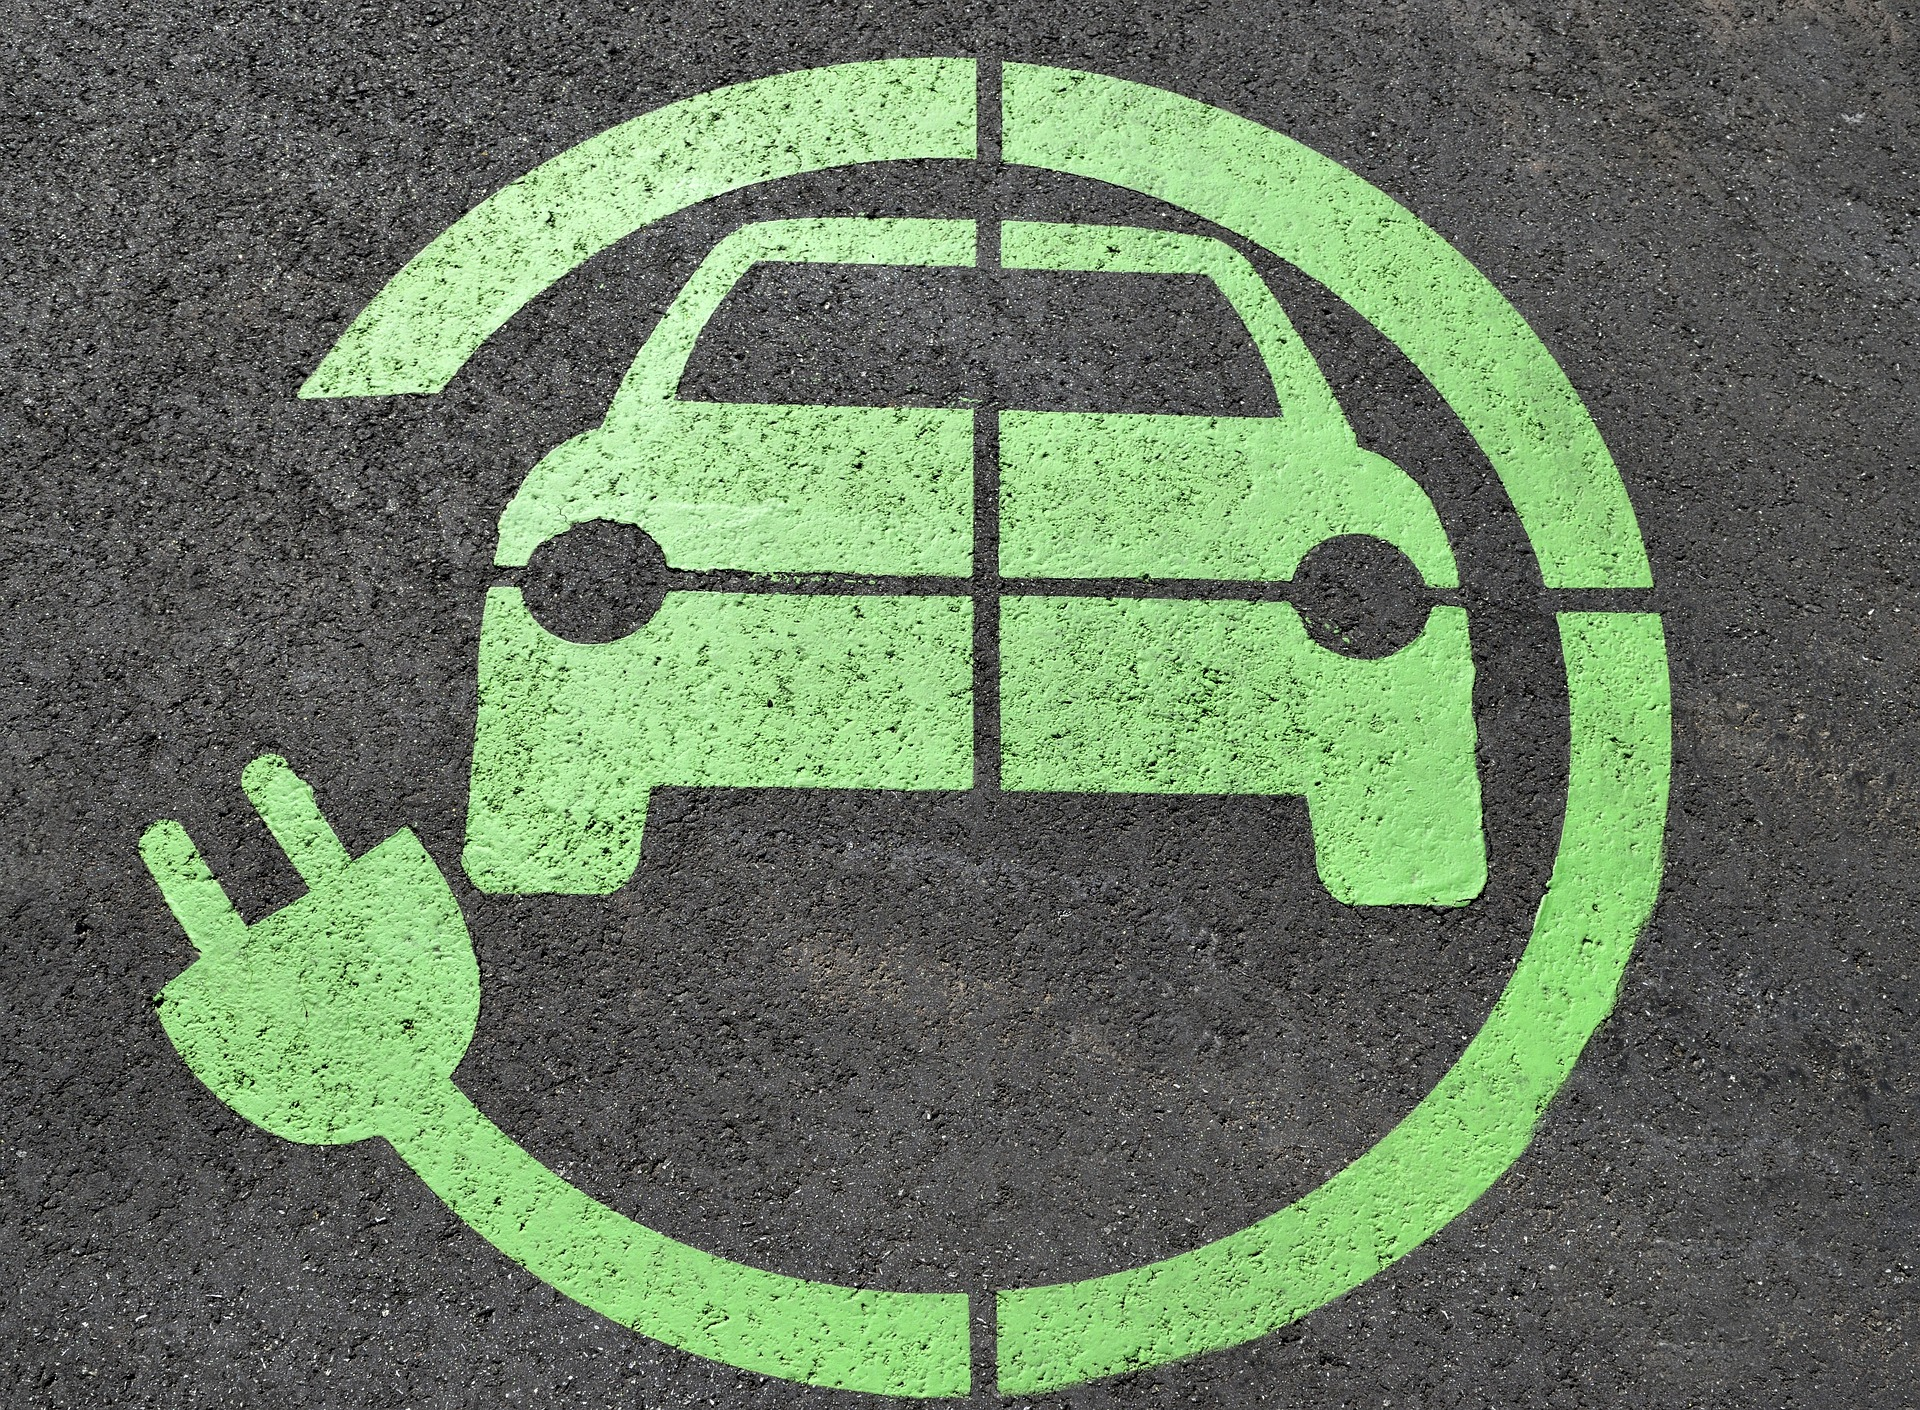 New Mobilities: Smart Planning for Emerging Transportation Technologies Webinar